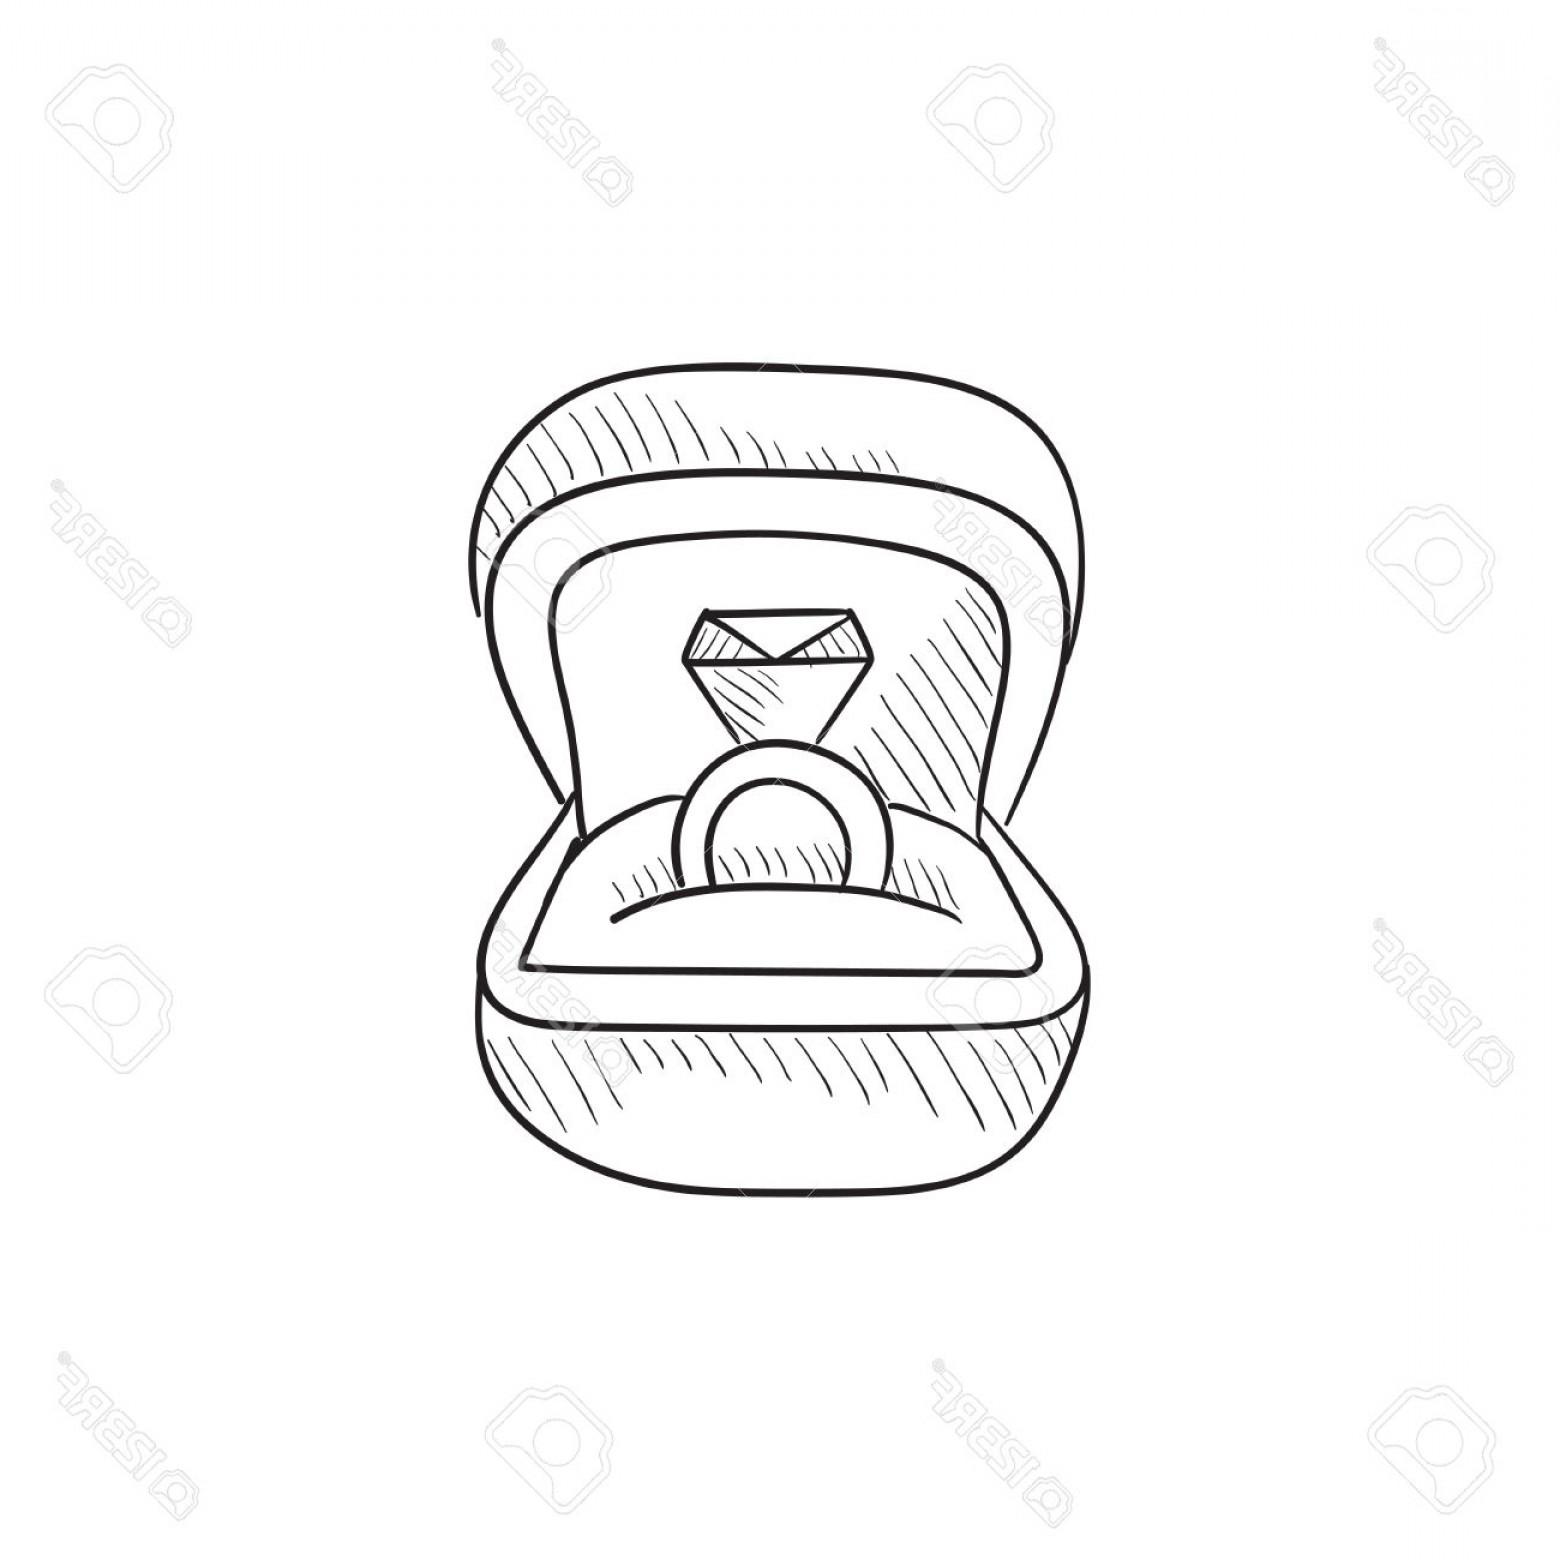 1560x1560 Photostock Vector Wedding Ring In Gift Box Vector Sketch Icon